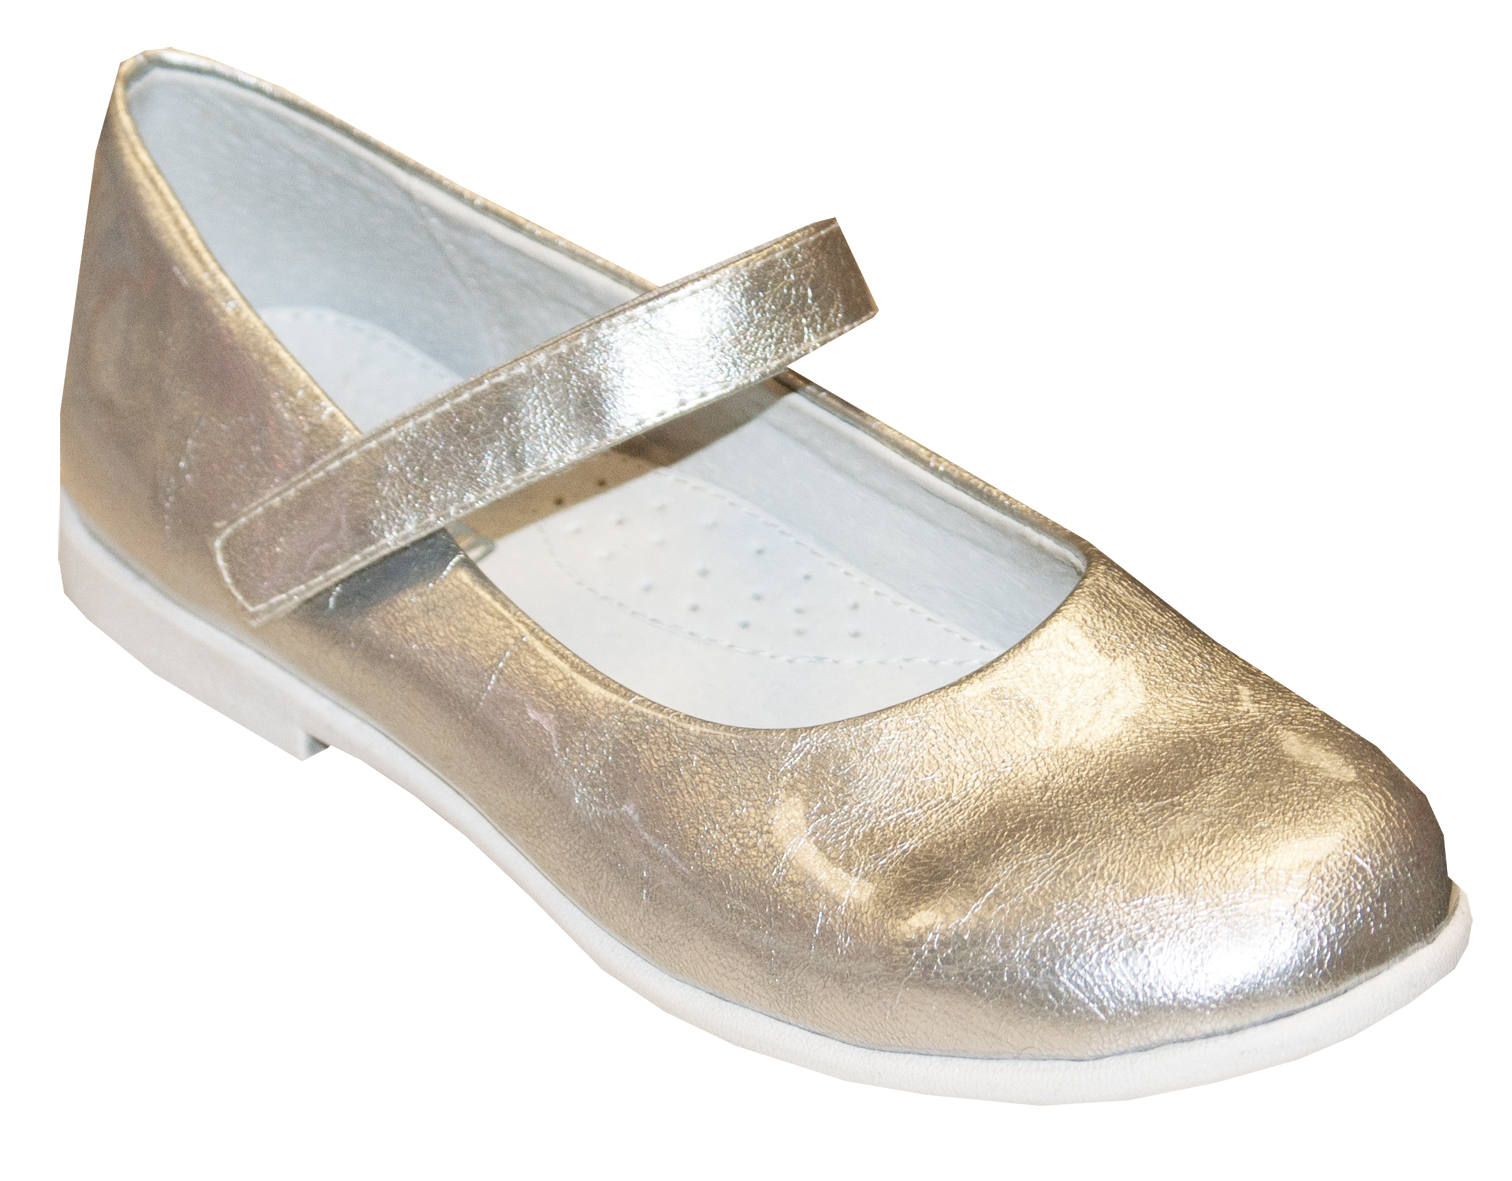 Туфли Barkito Туфли для девочки Barkito серебряные туфли acoola для девочки цвет серебряный